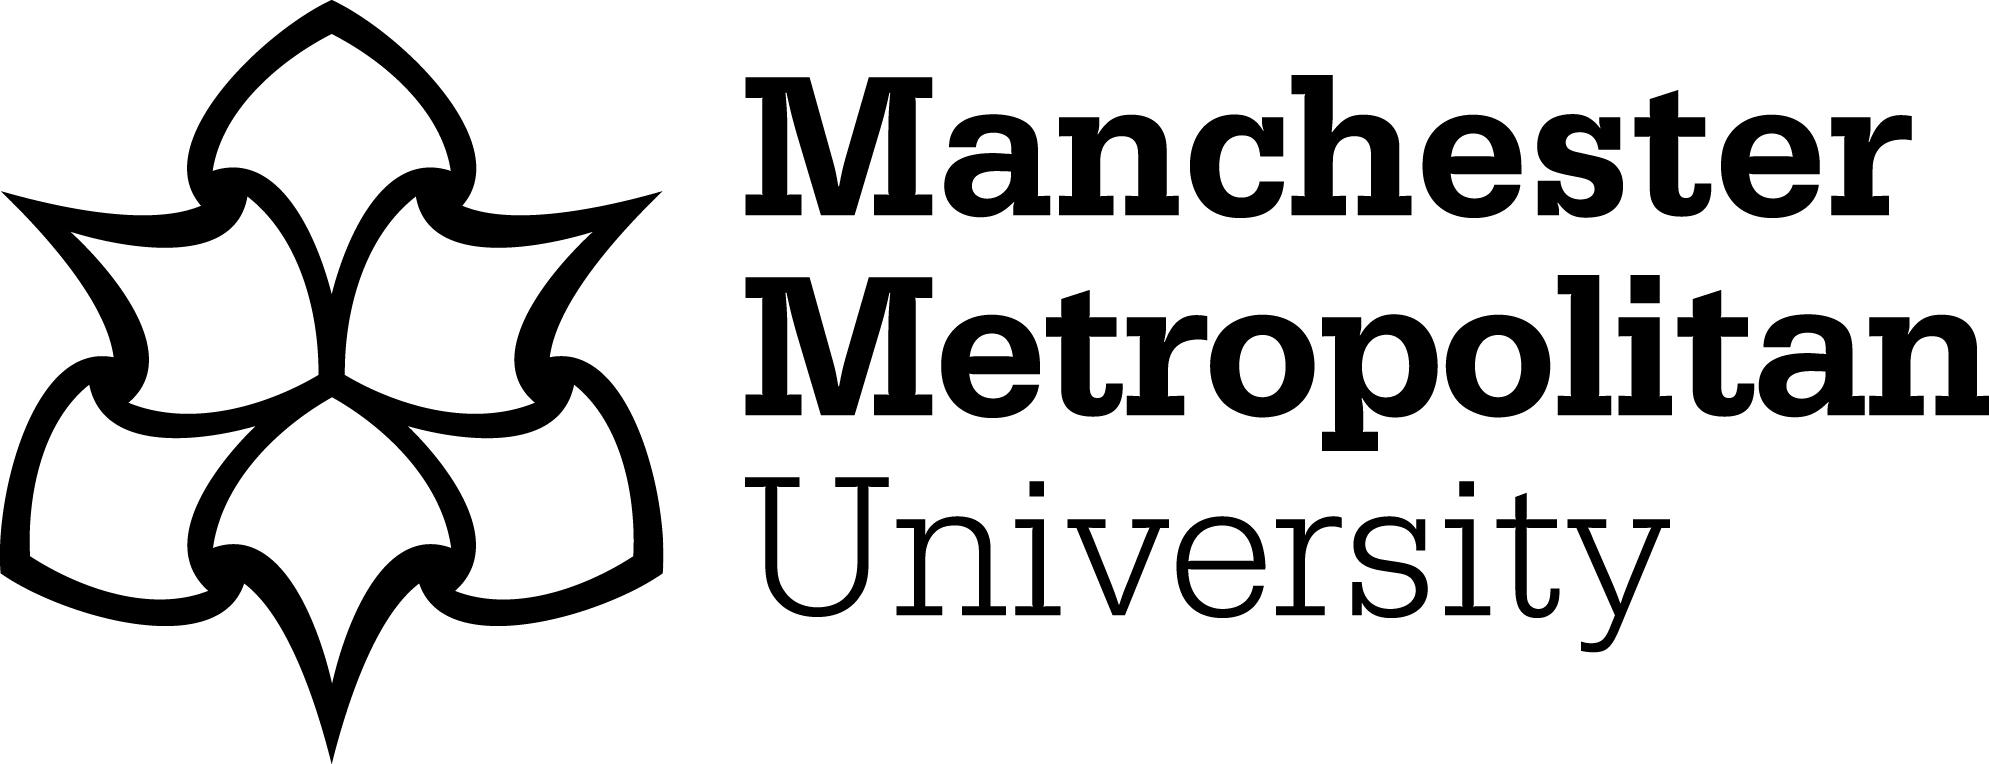 Manchester Metropolitan University img-responsive